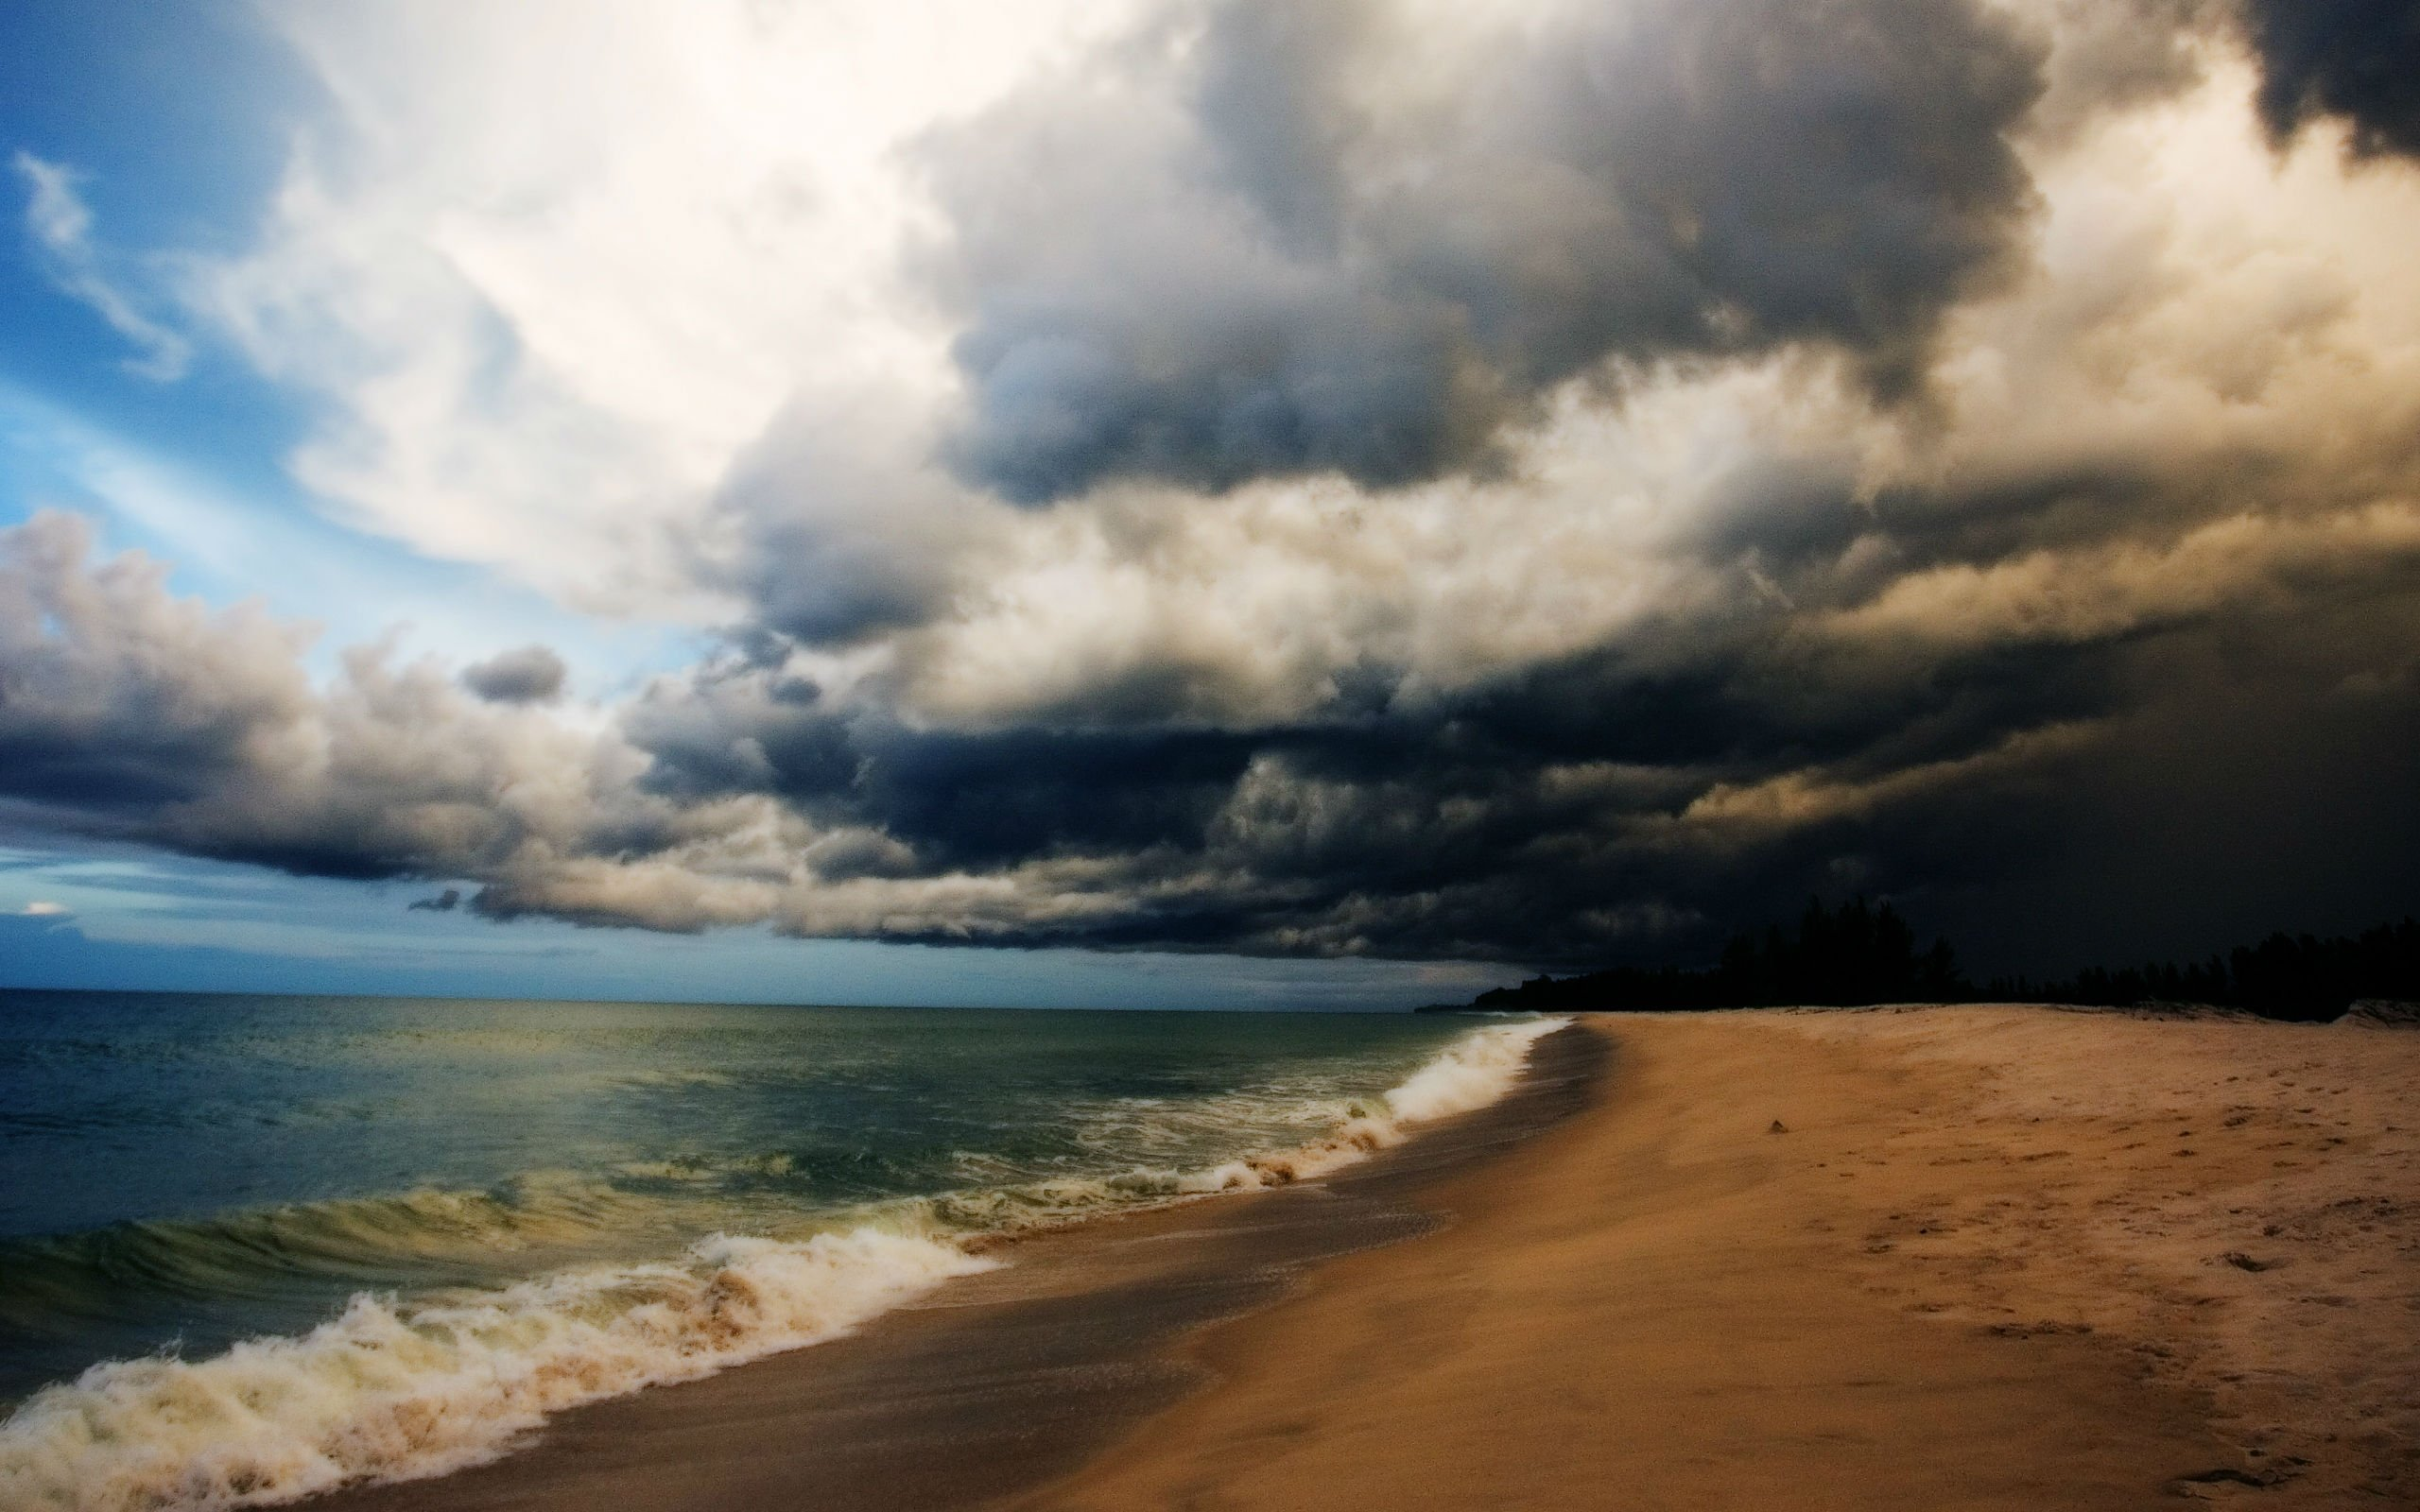 Beach Thunderstorm Wallpaper: STORM Weather Rain Sky Clouds Nature Ocean Sea Waves Beach